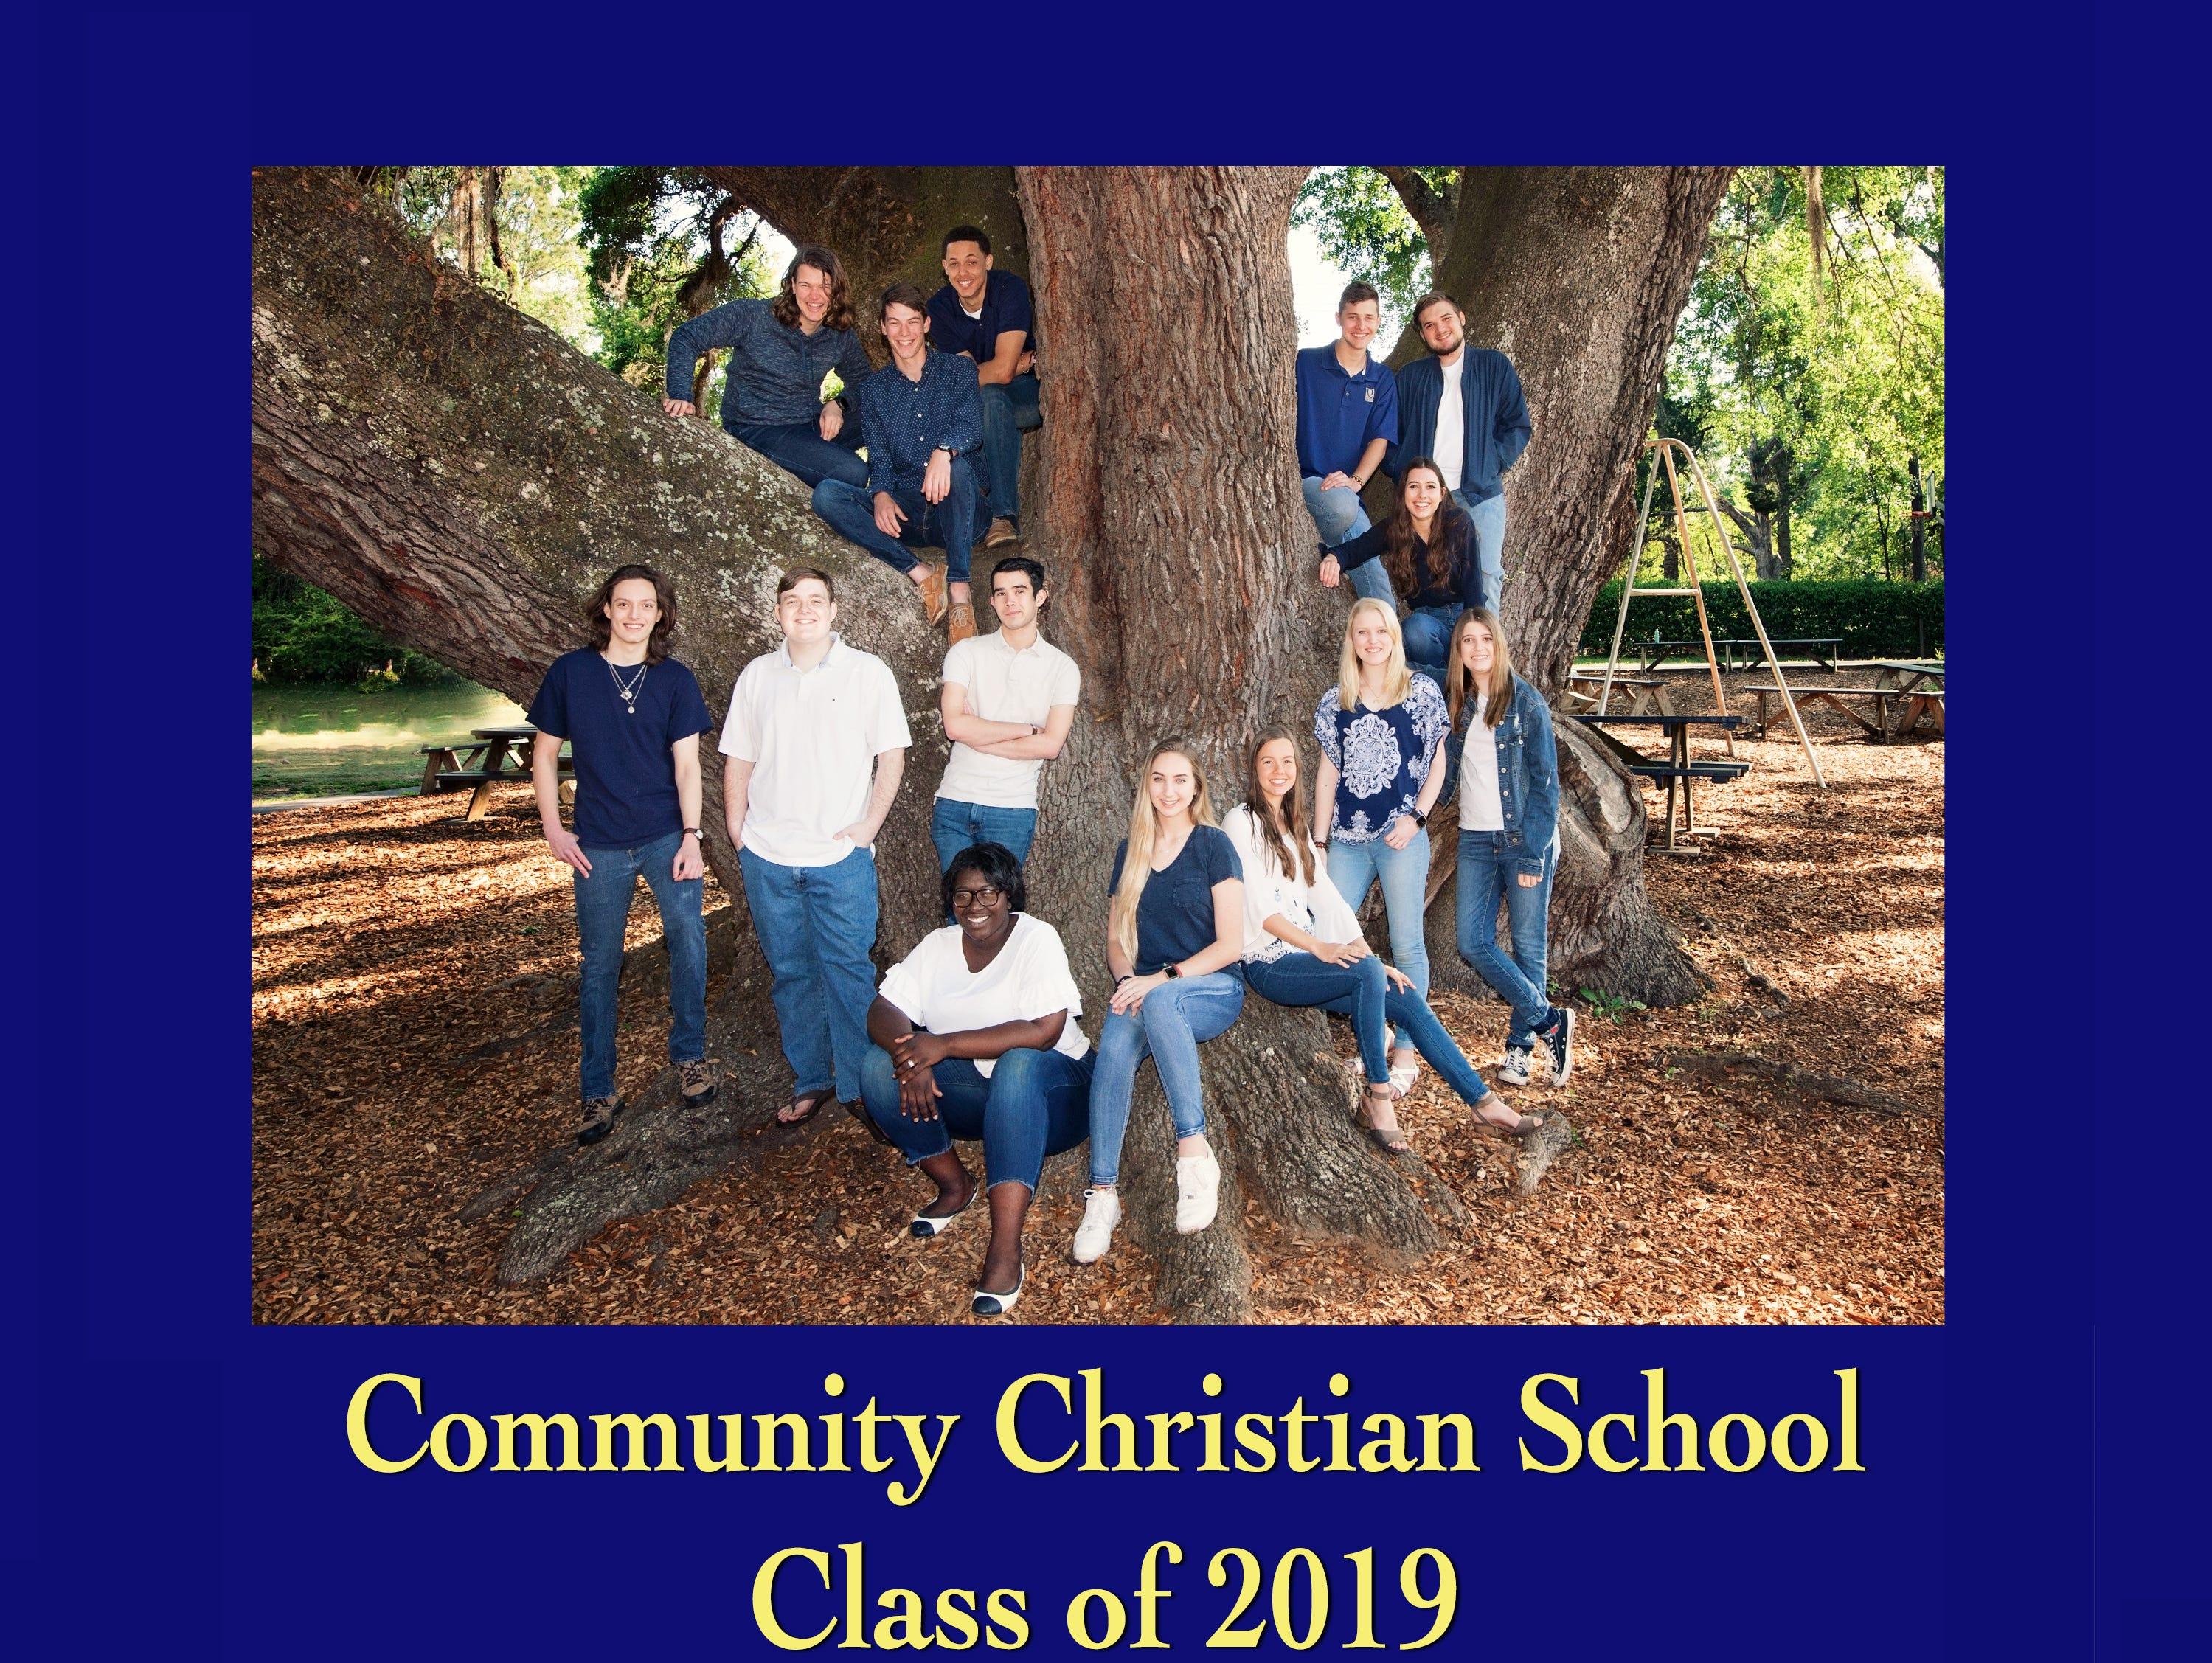 Community Christian School Class of 2019.